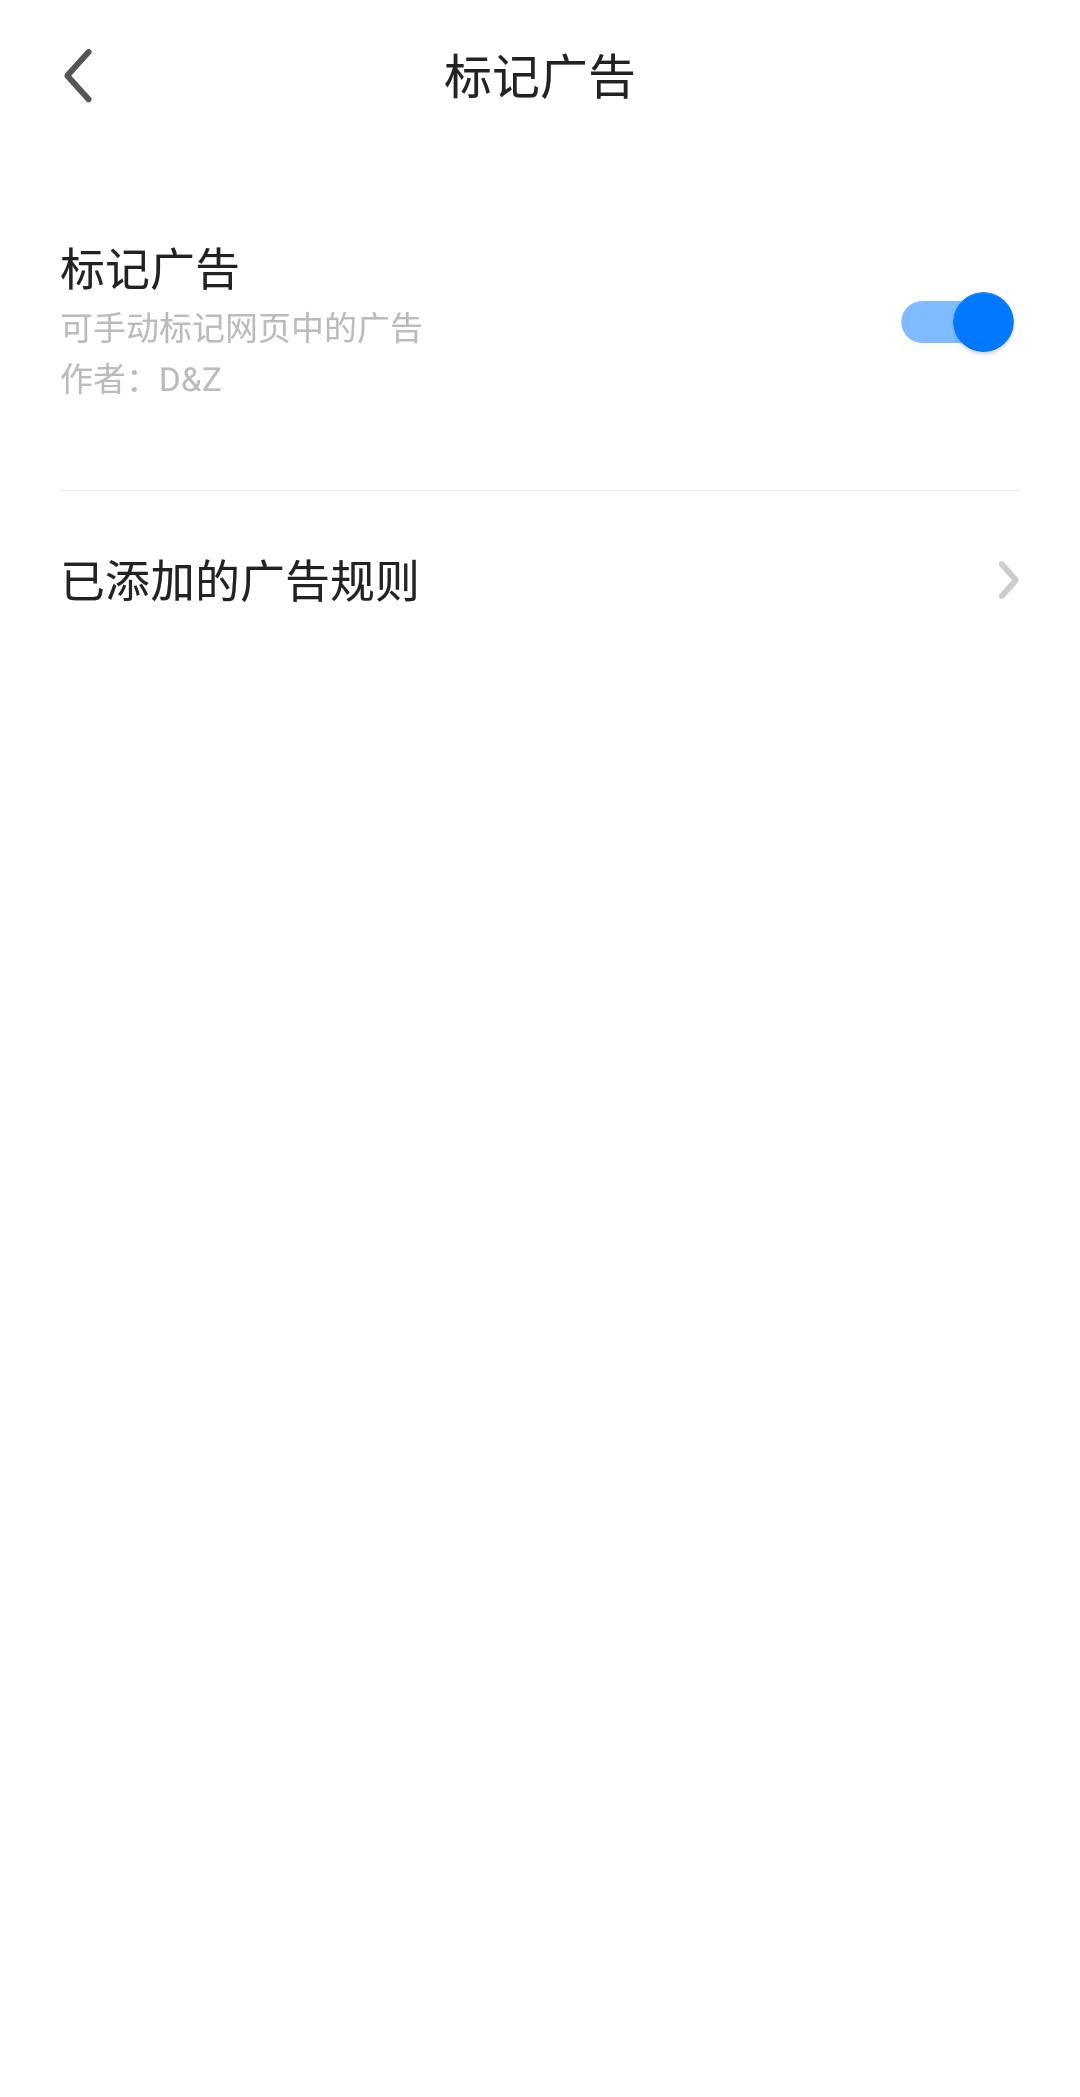 Screenshot_2019-09-07-17-45-40.png